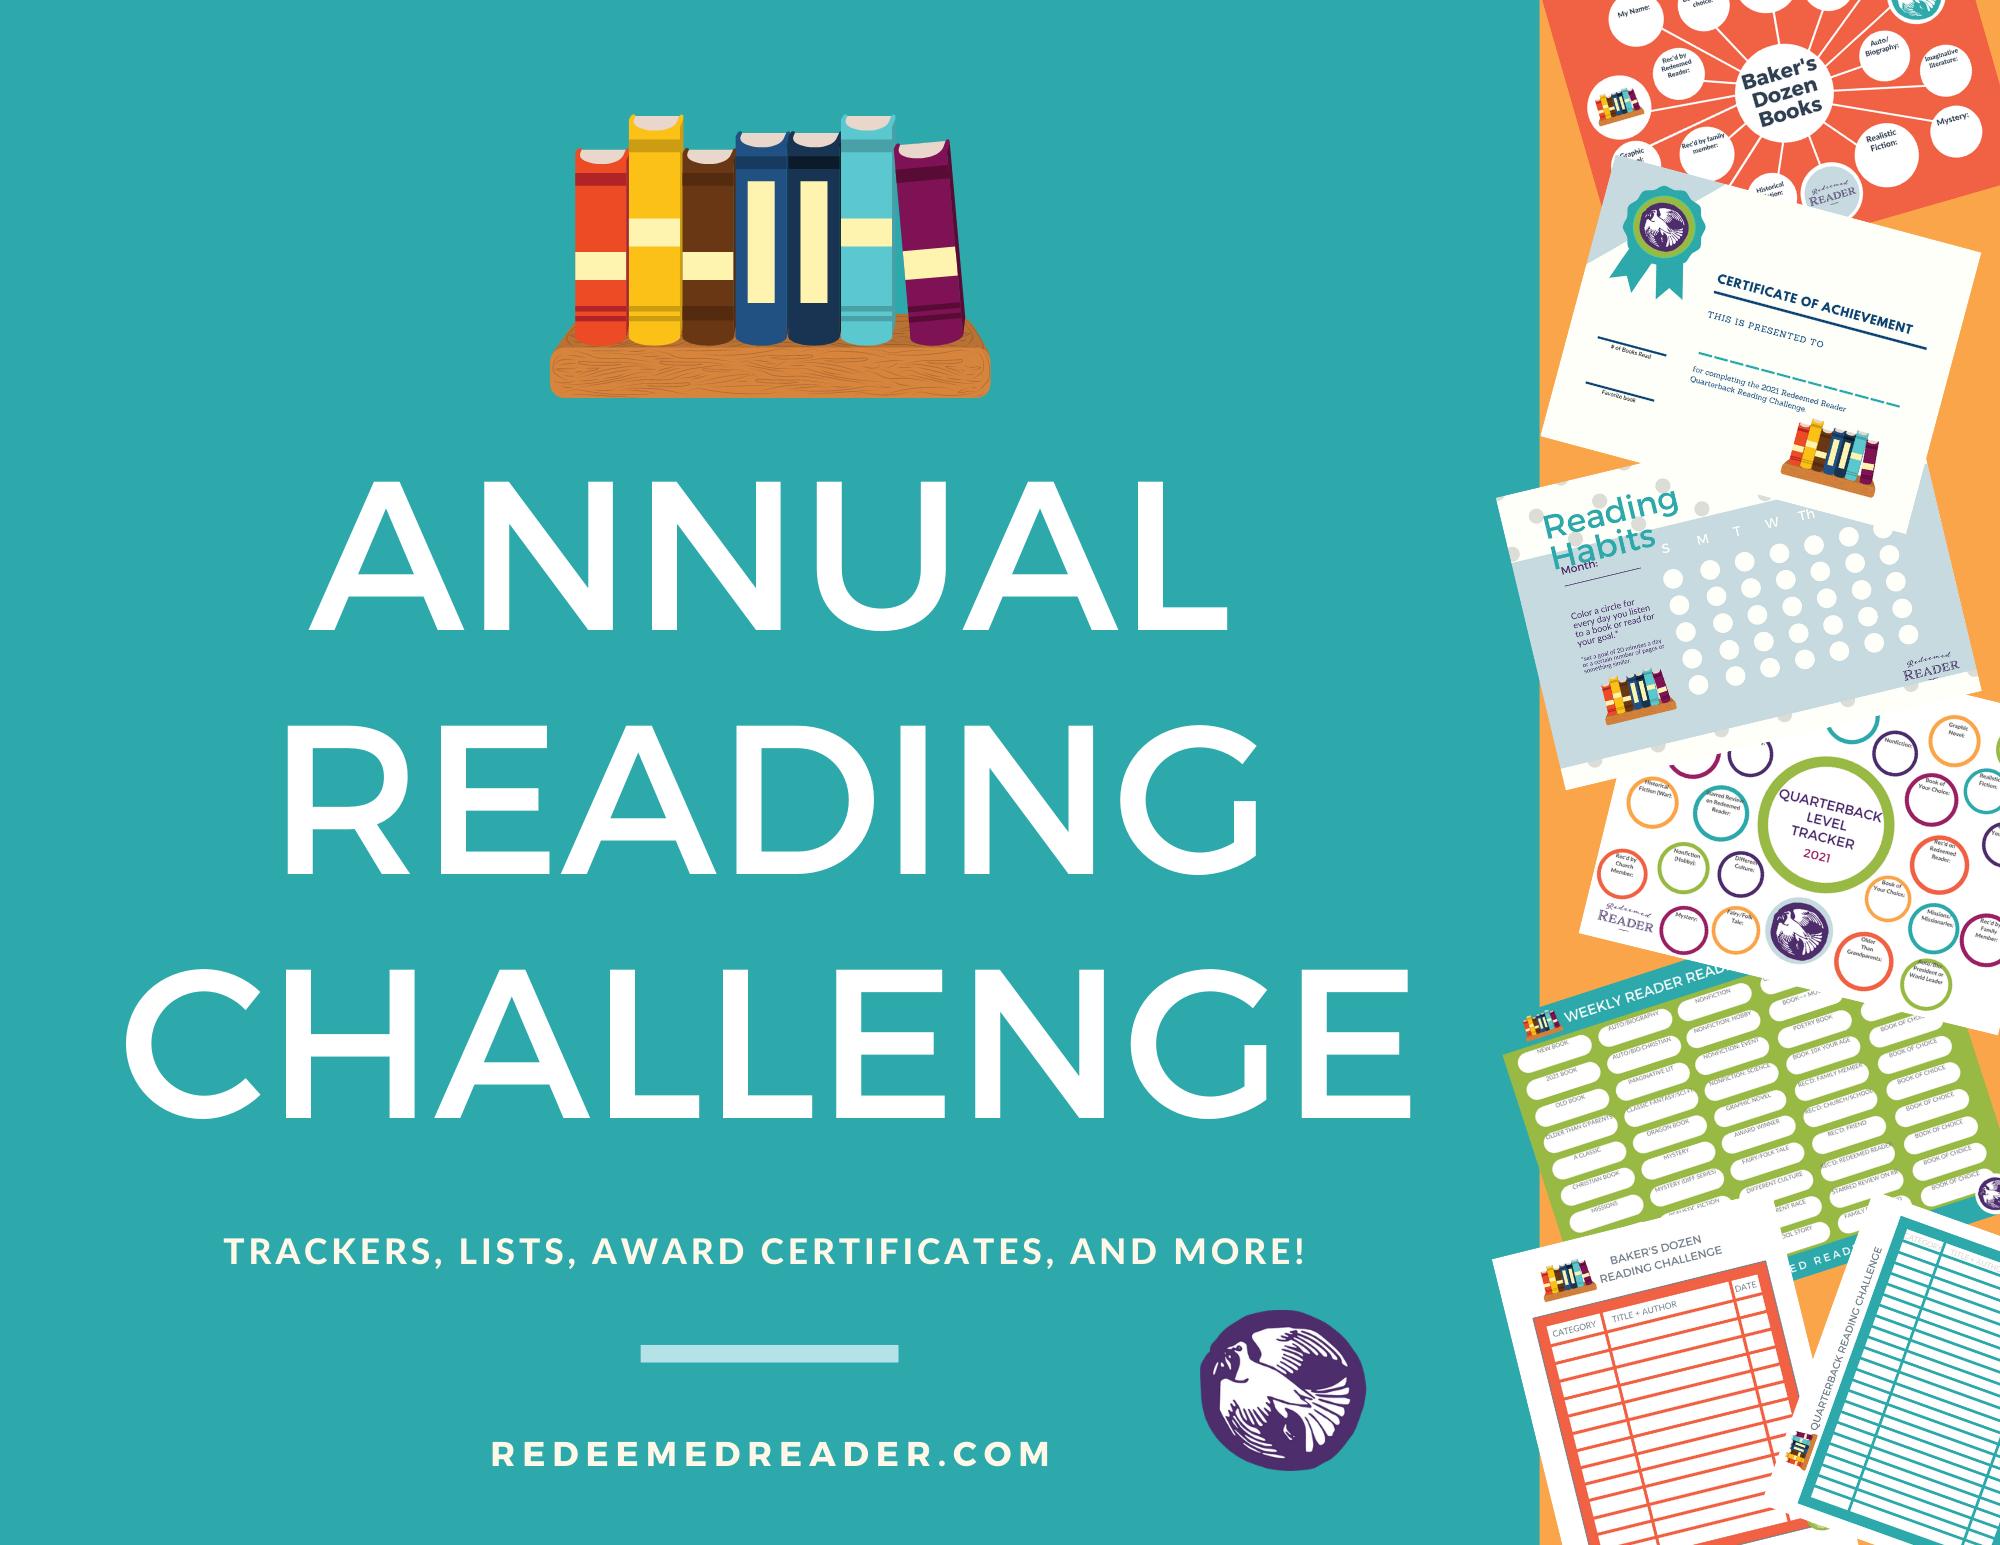 Reading Challenge Upsell